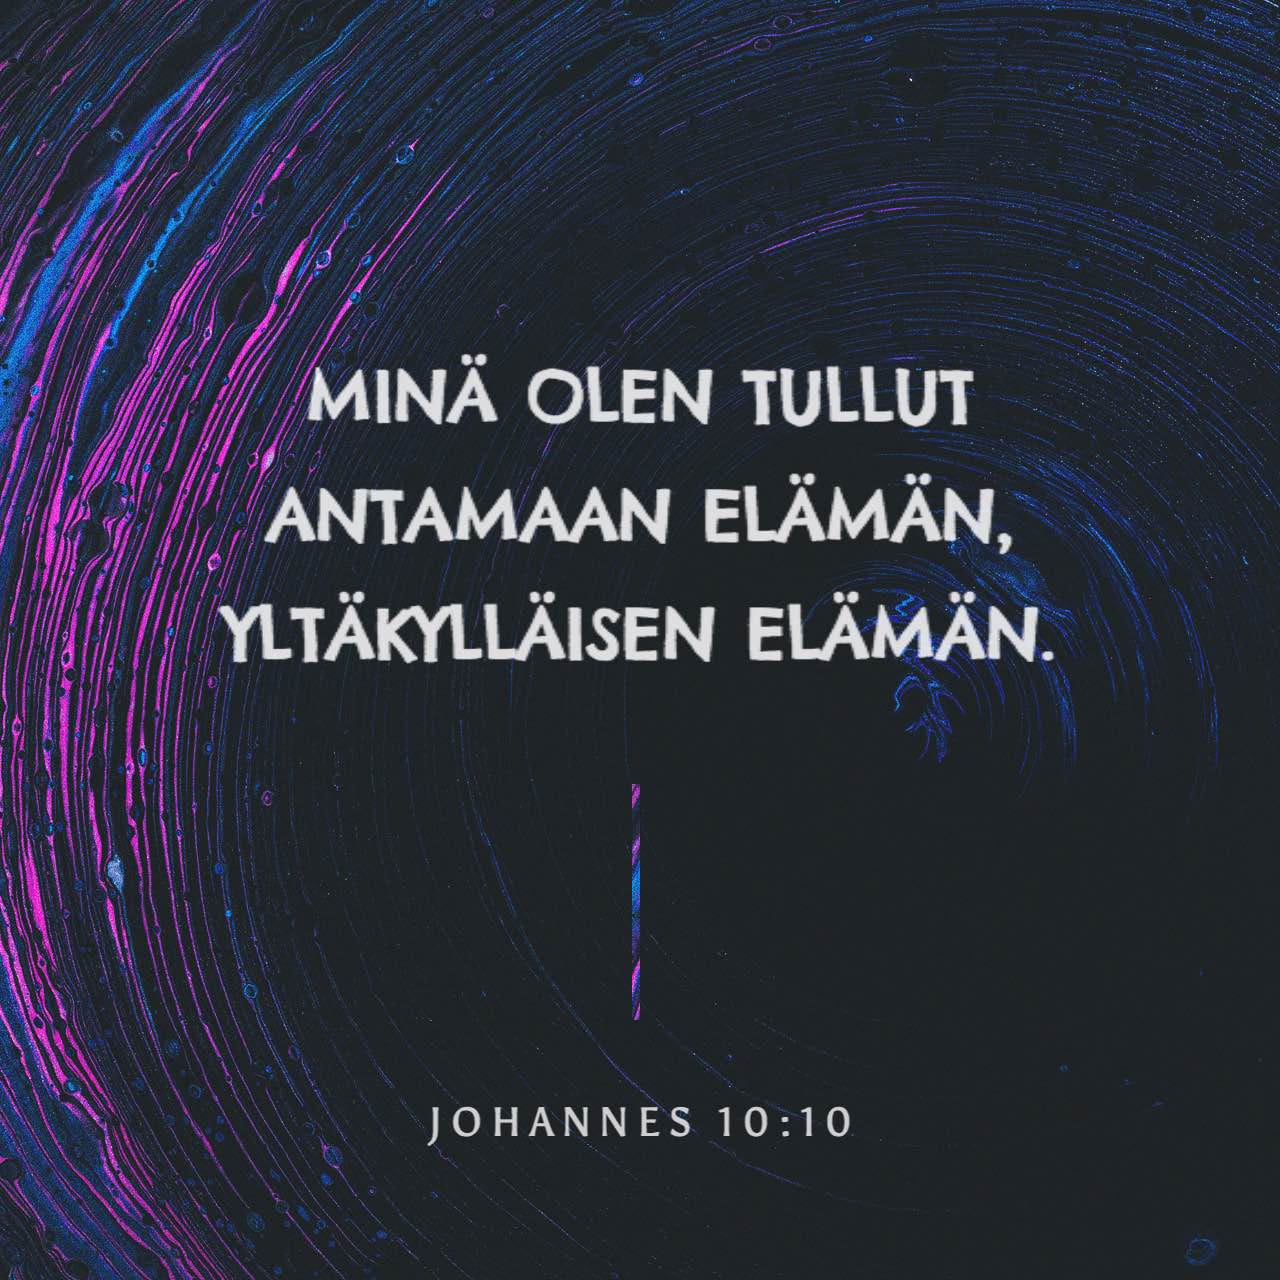 Johannes 10:10